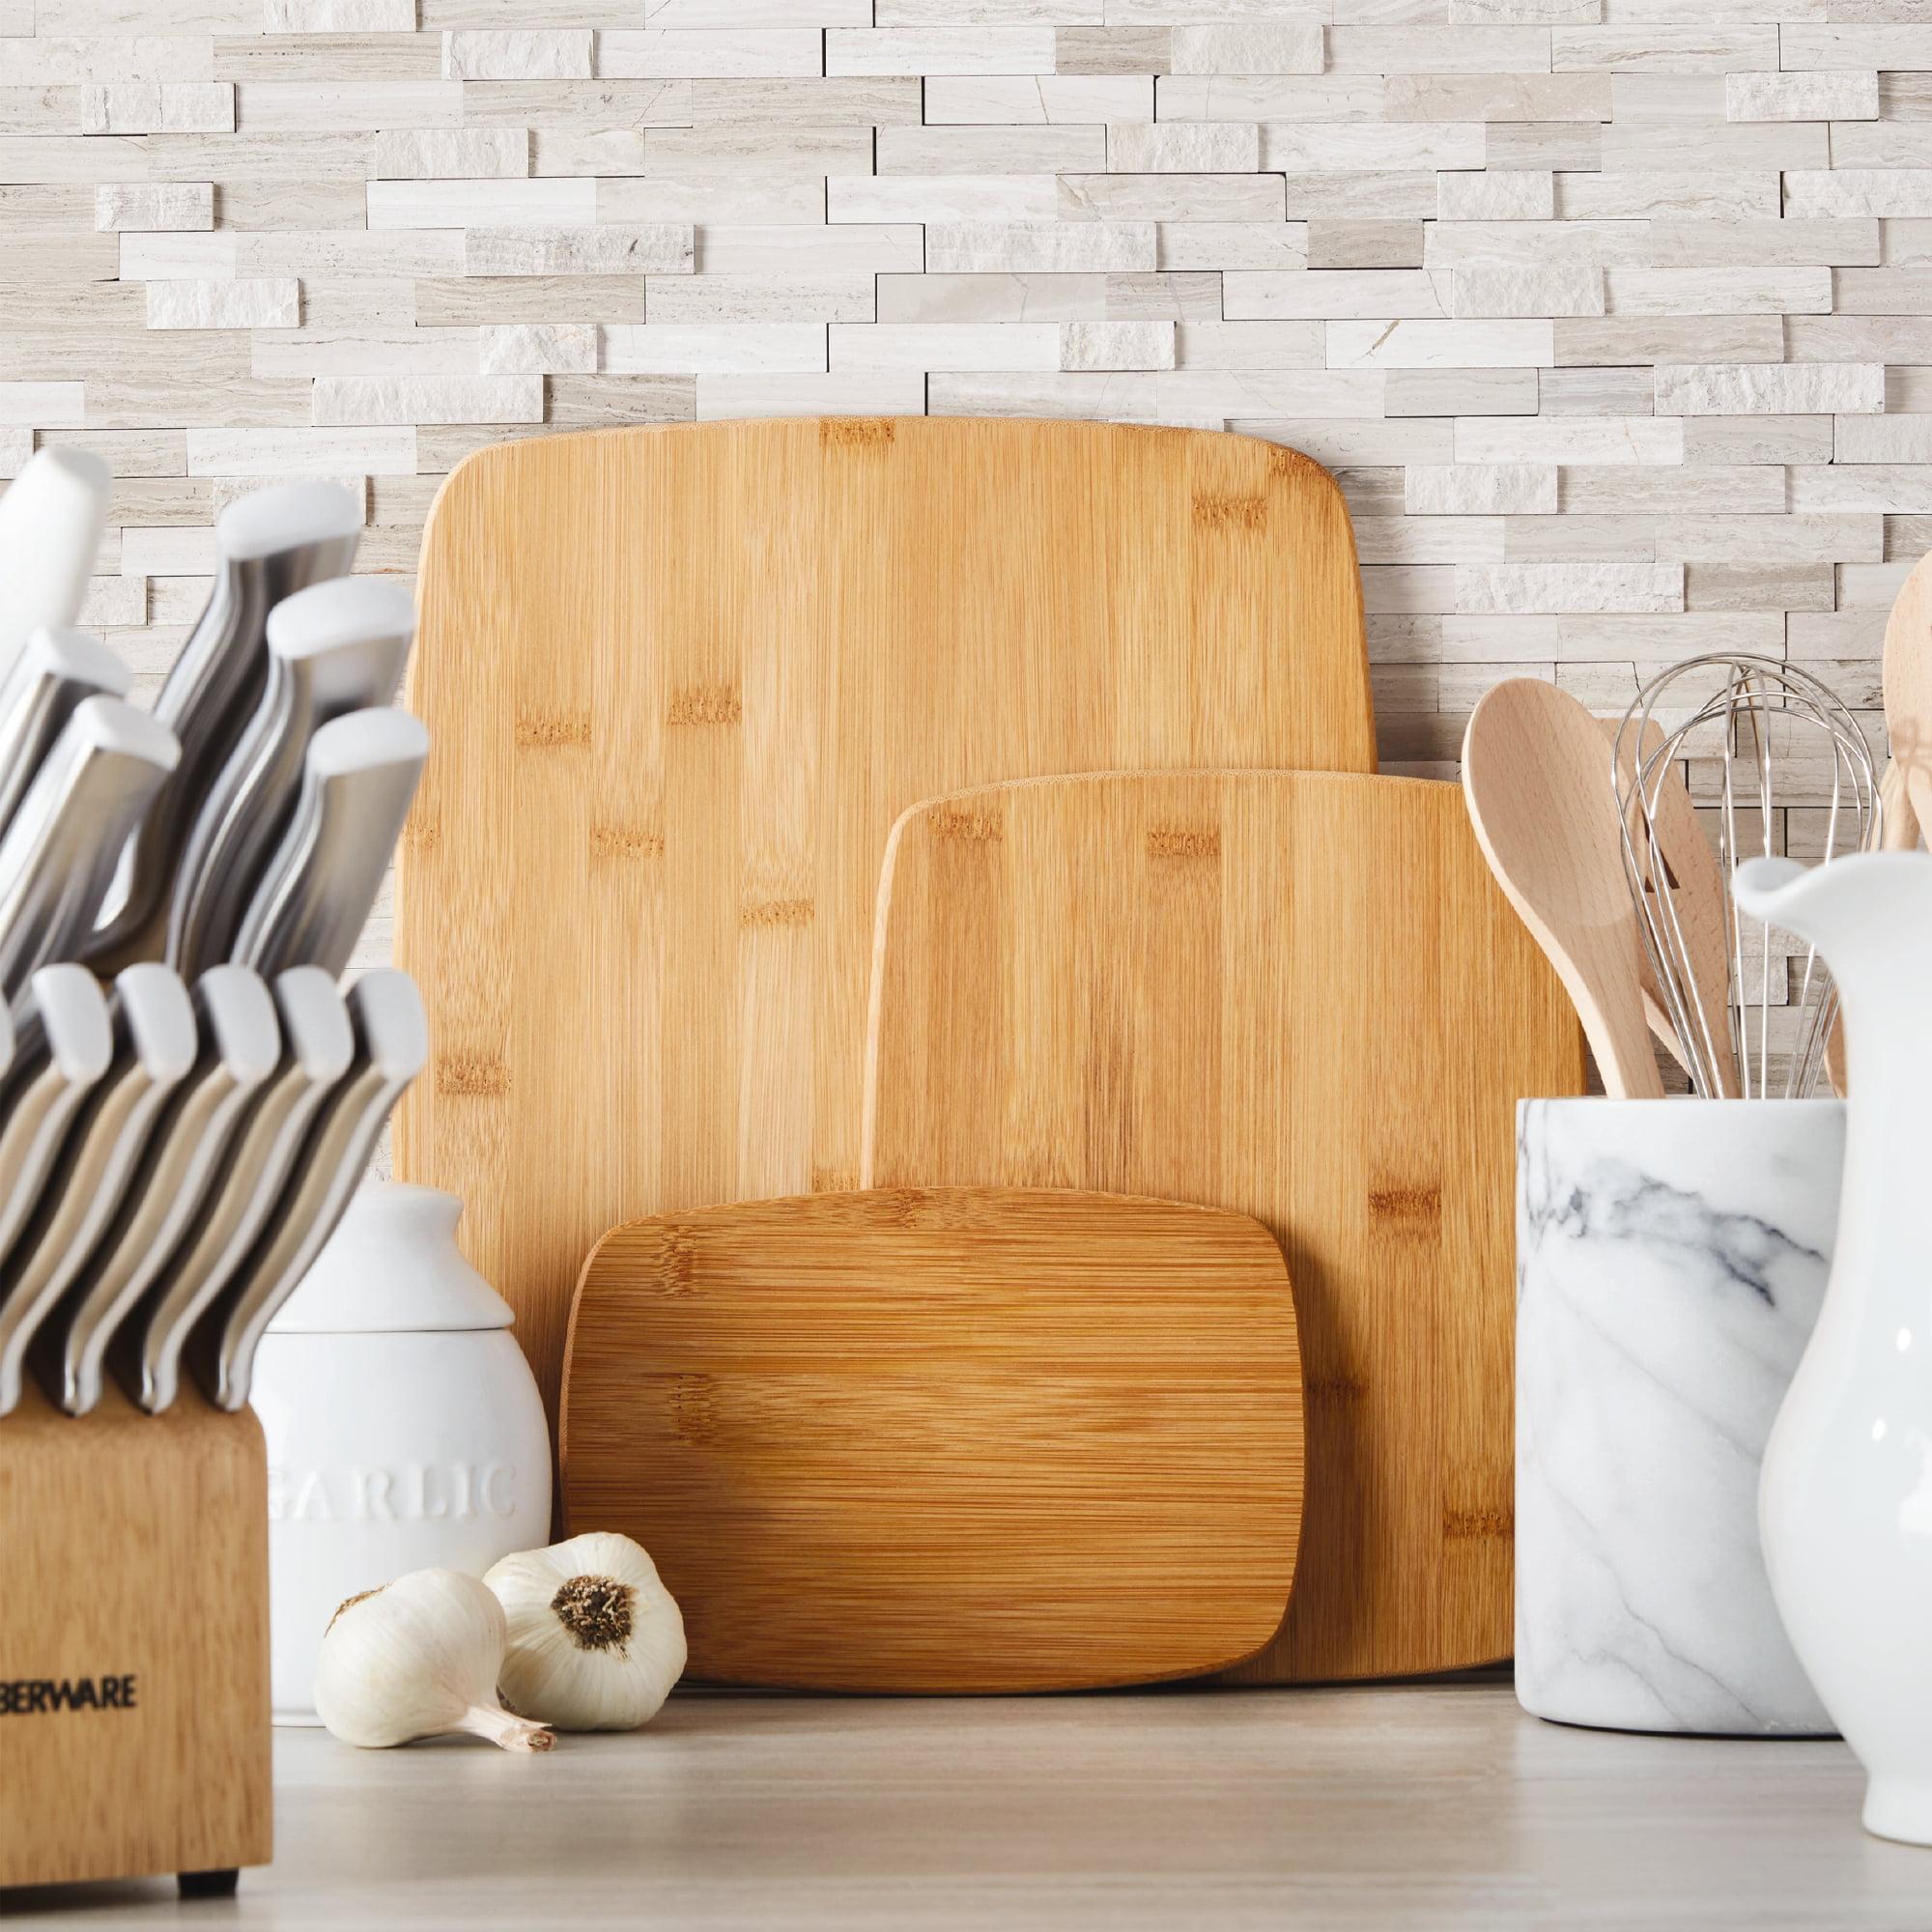 Farberware Classic Three Piece Bamboo Cutting Board Set by Lifetime Brands